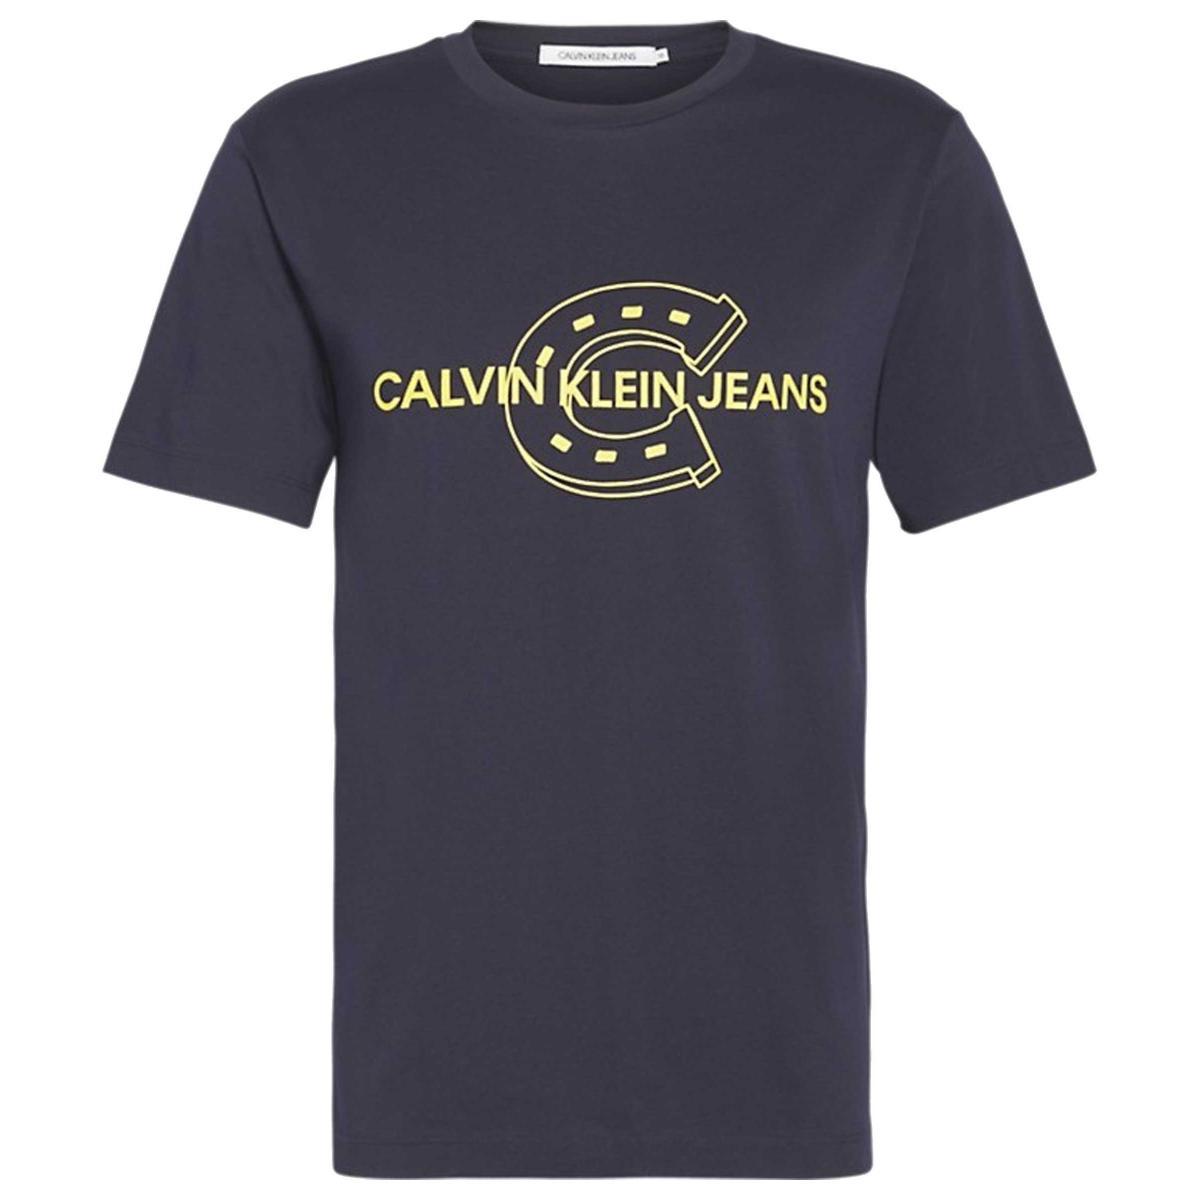 T-shirt Calvin Klein Jeans con stampa da uomo rif. J30J311300